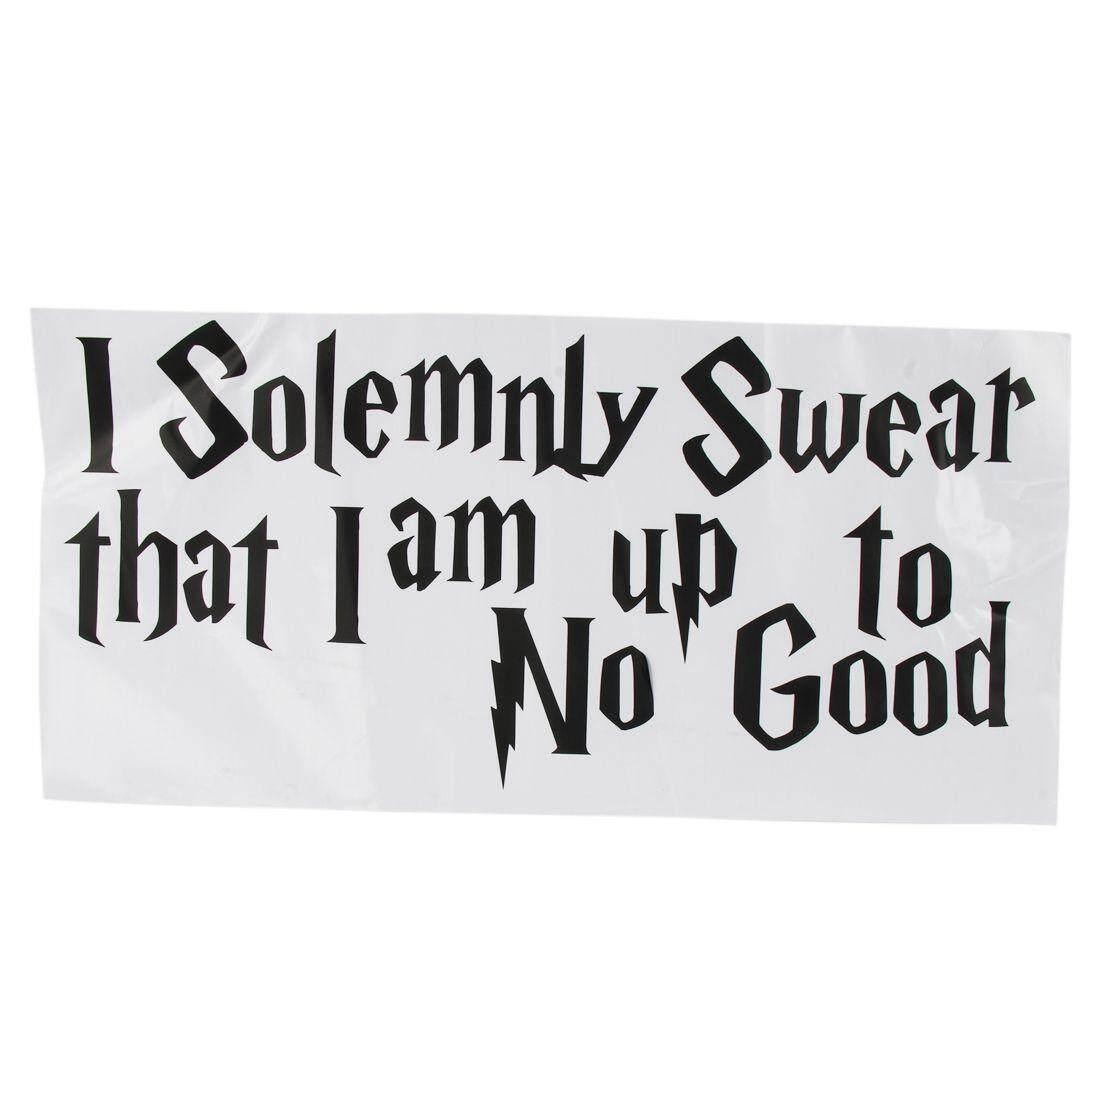 Dinding Stiker Stiker Quote Saya dengan Sungguh-sungguh Bersumpah Aku Sampai Tidak Ada Yang Baik